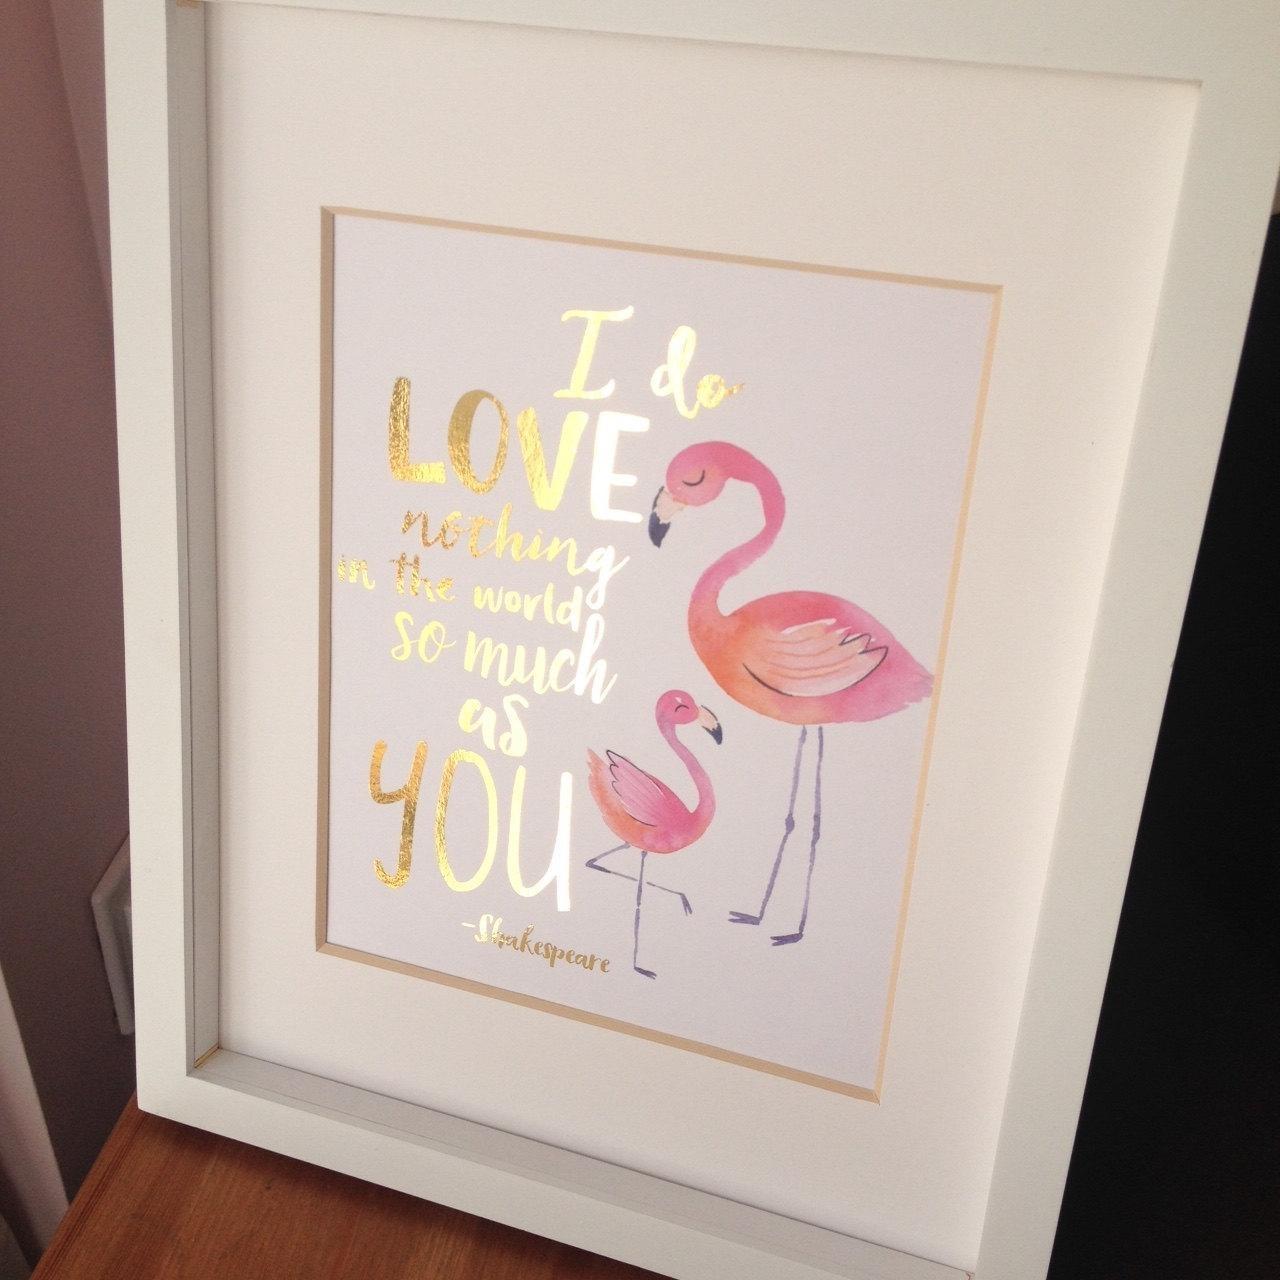 Flamingo Nursery Wall Art Gold Foil Print Shakespeare Quote Intended For Shakespeare Wall Art (Image 7 of 20)